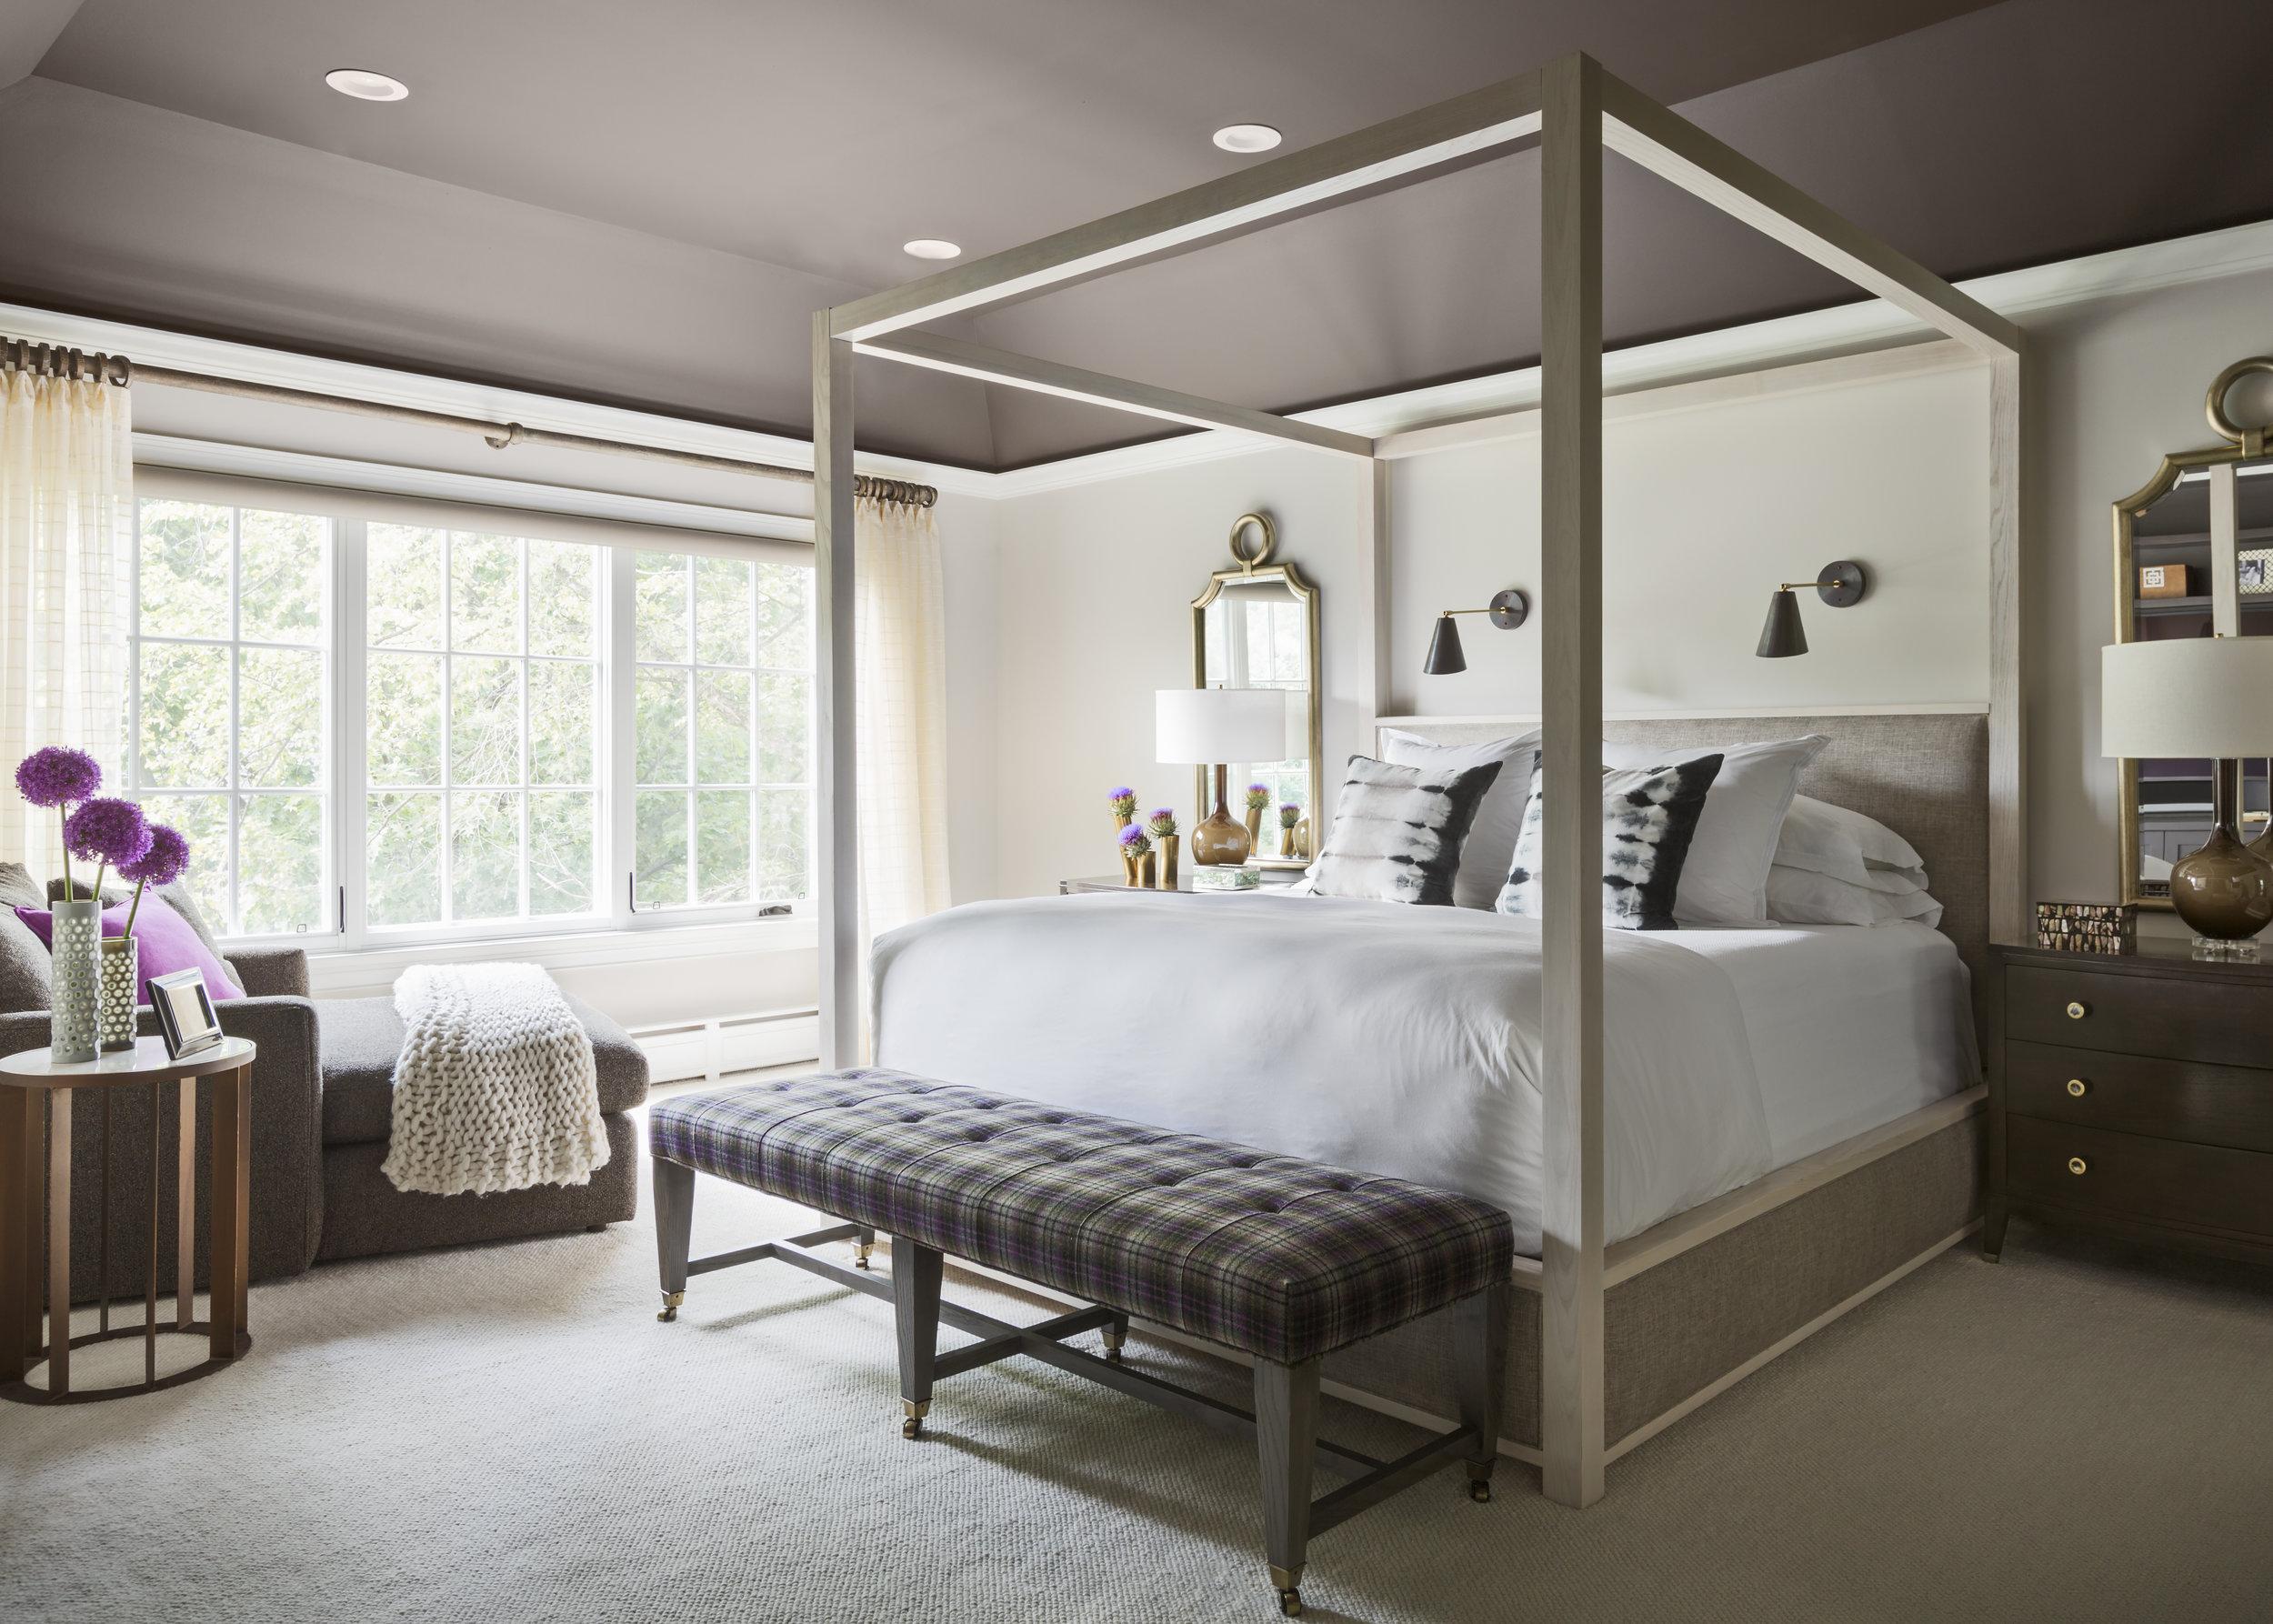 13 Dalliance_Halper_Bedroom.jpg